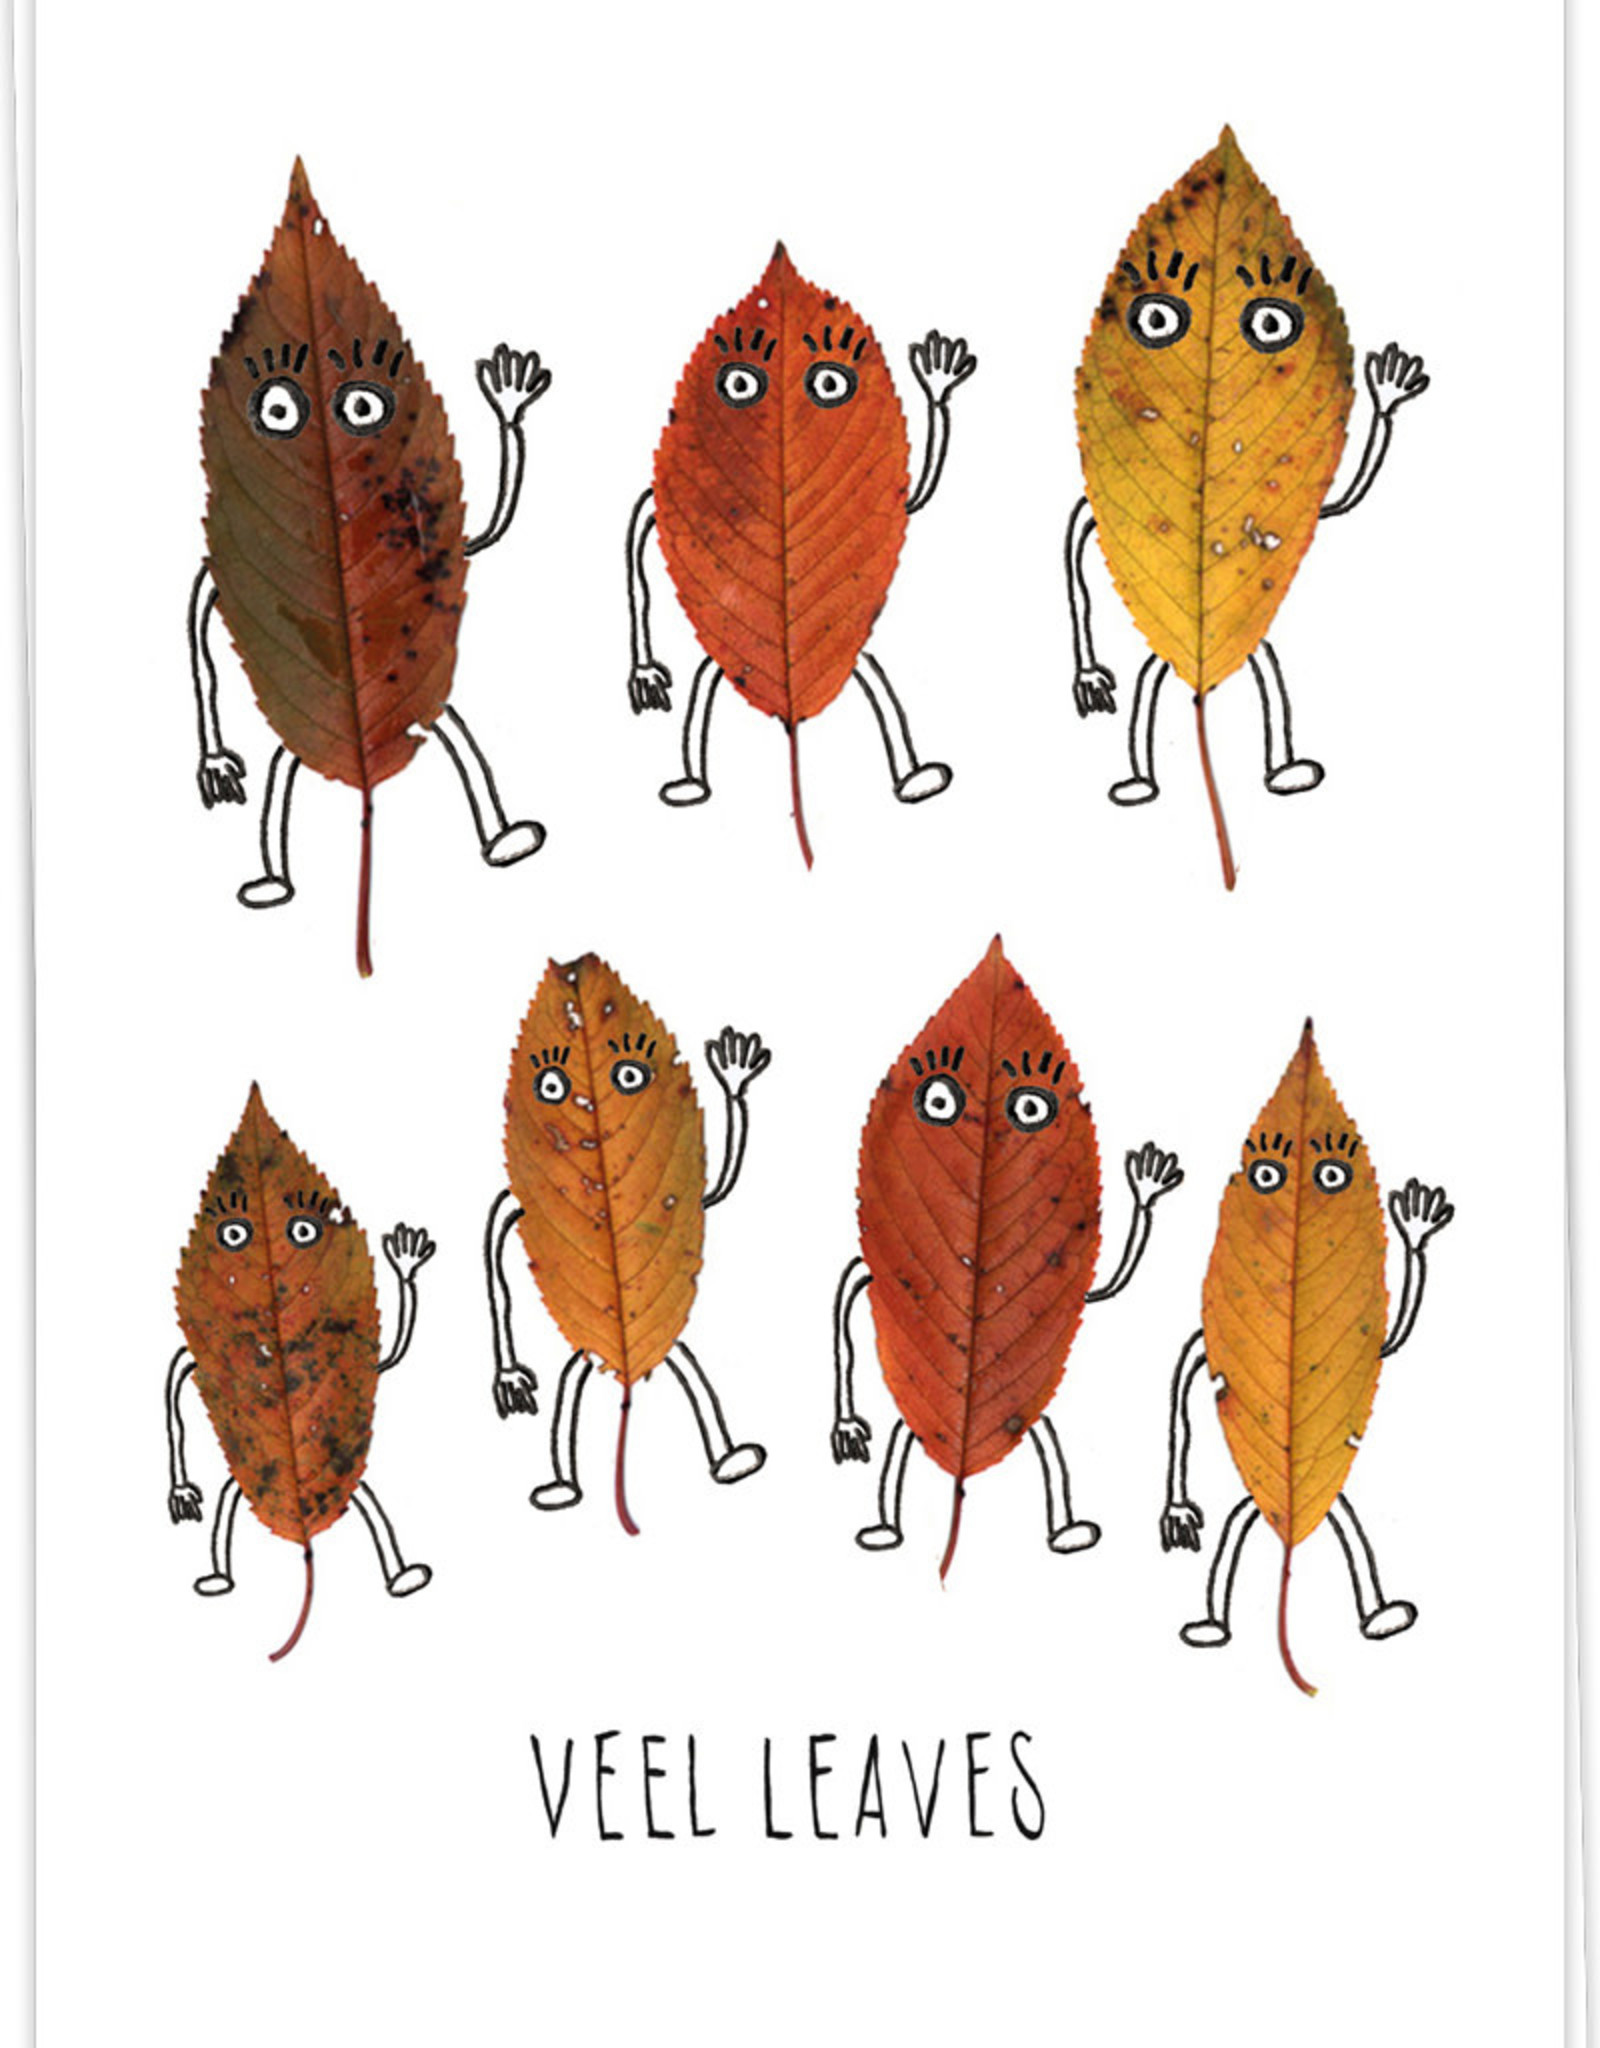 KAART BLANCHE KAART BLANCHE Veel Leaves